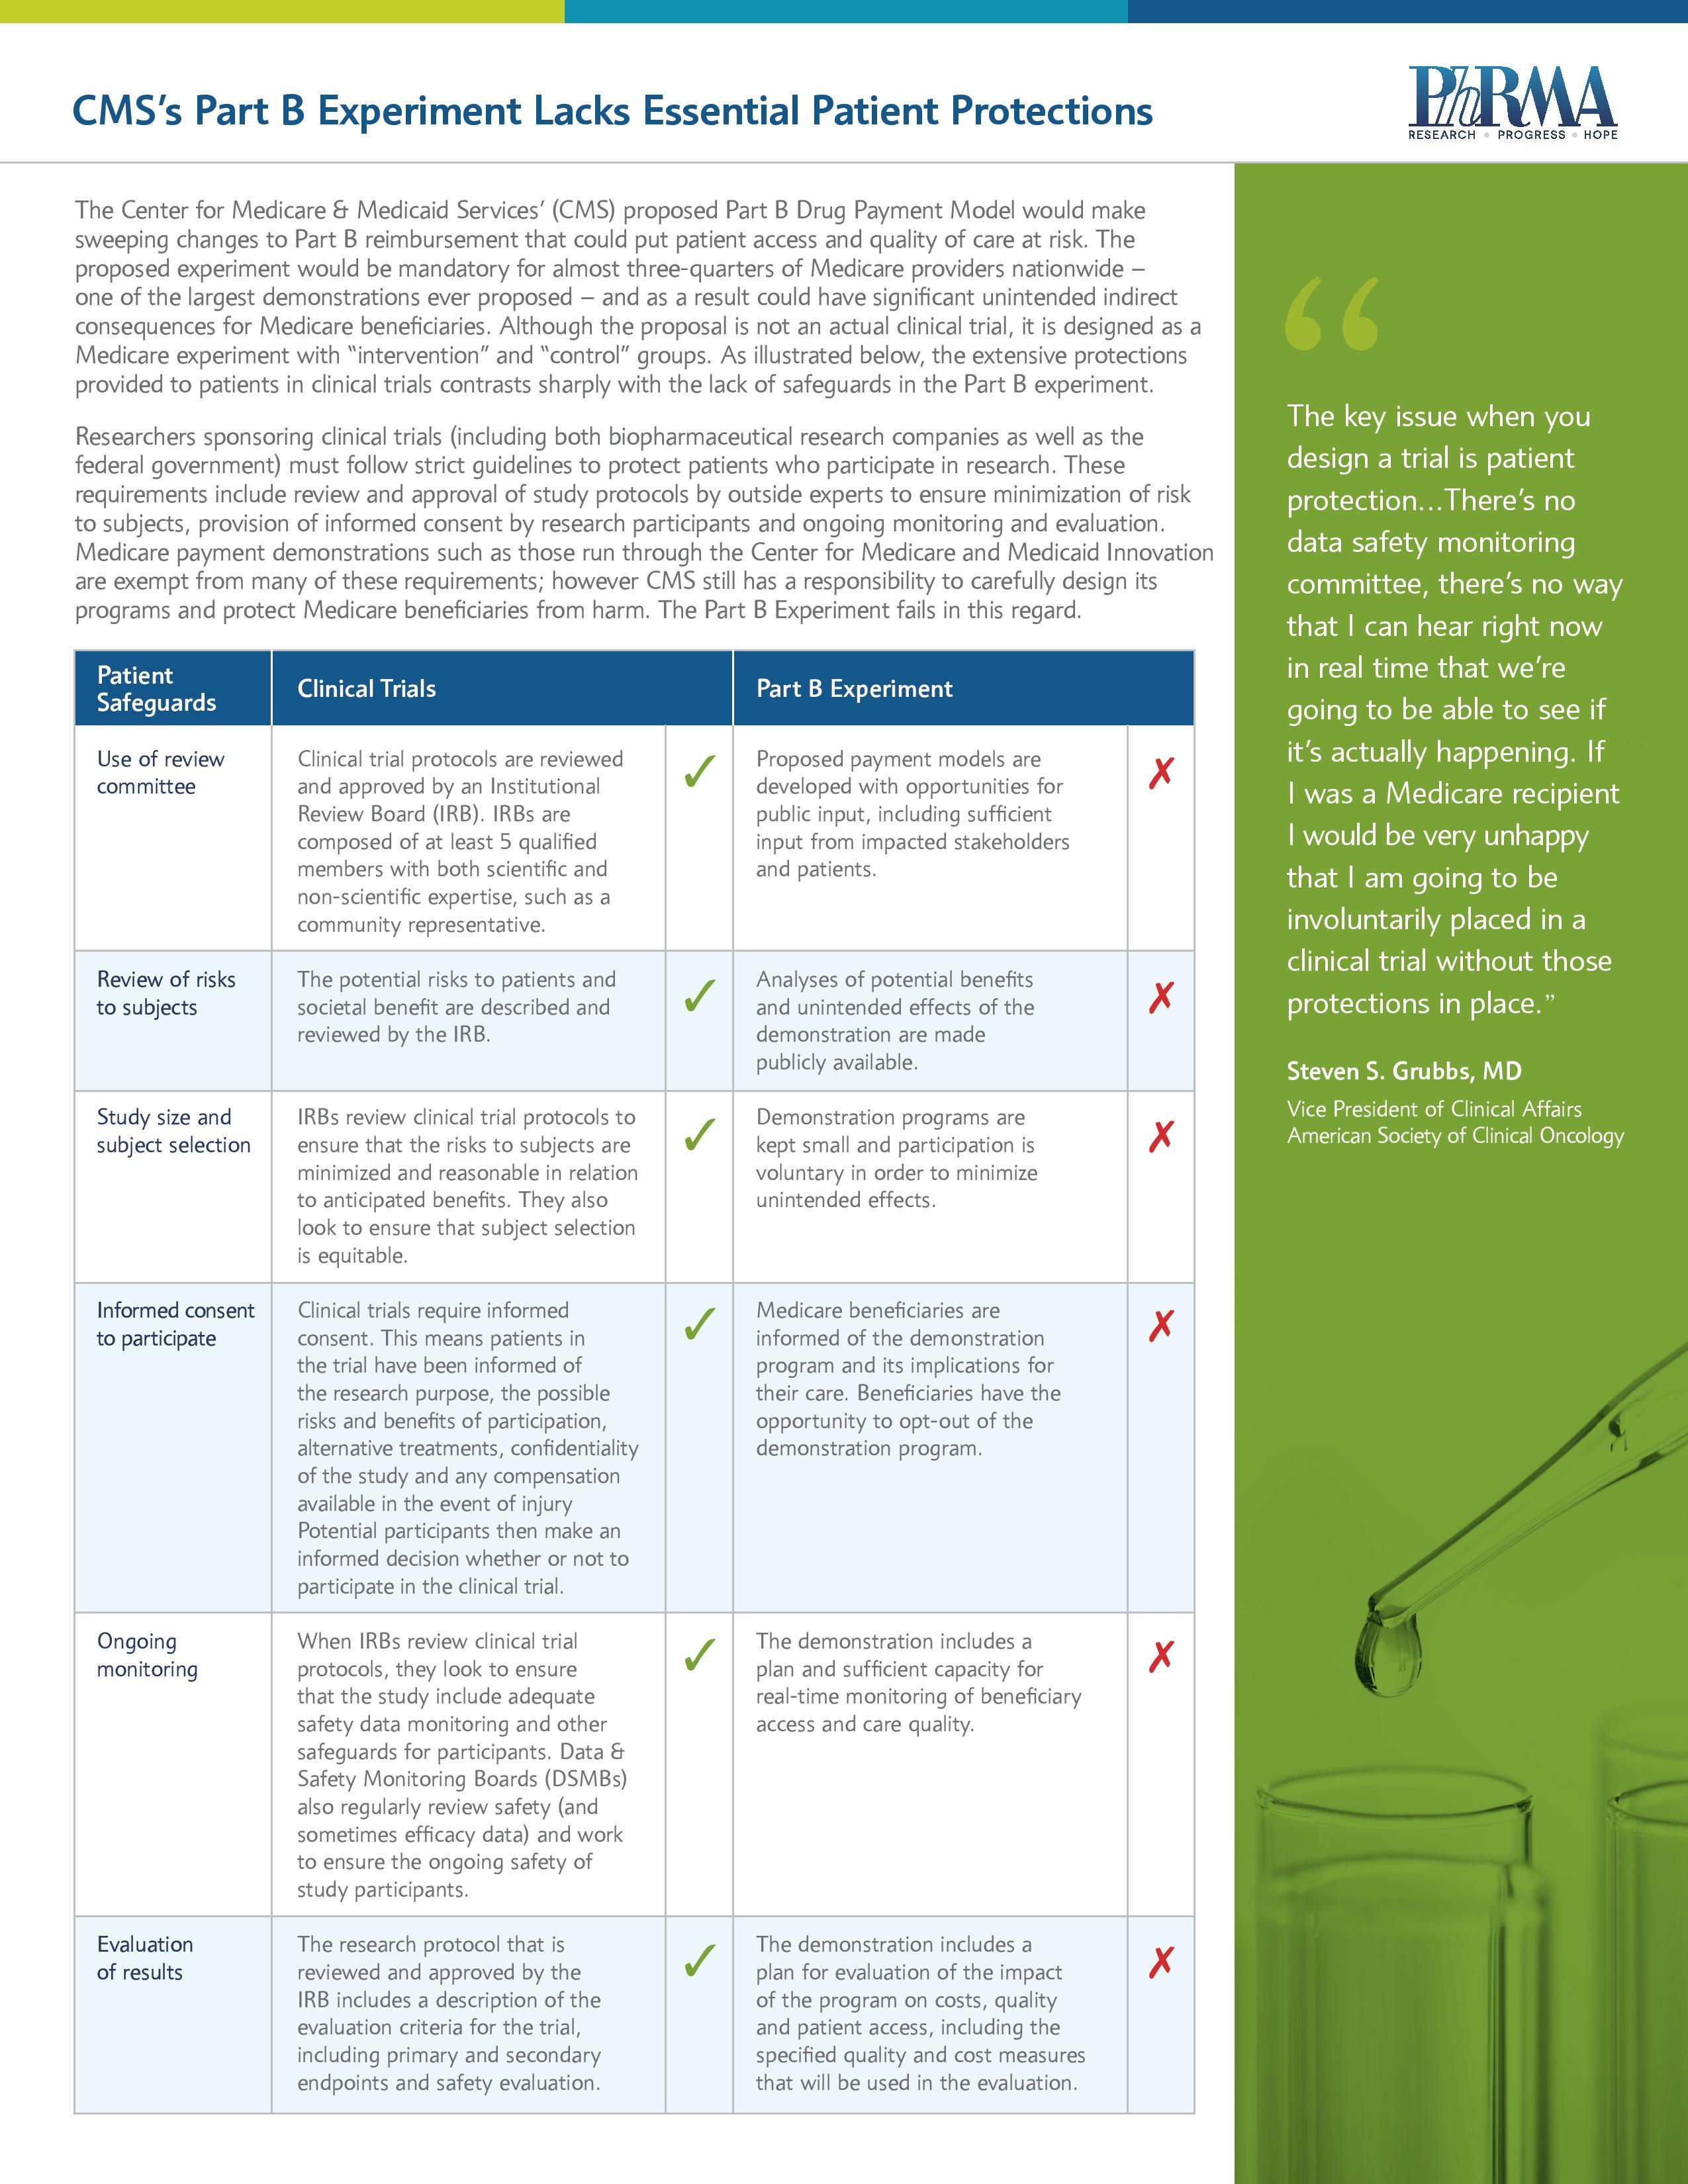 a description of providing cancer clinical trials for medicare benificiaries